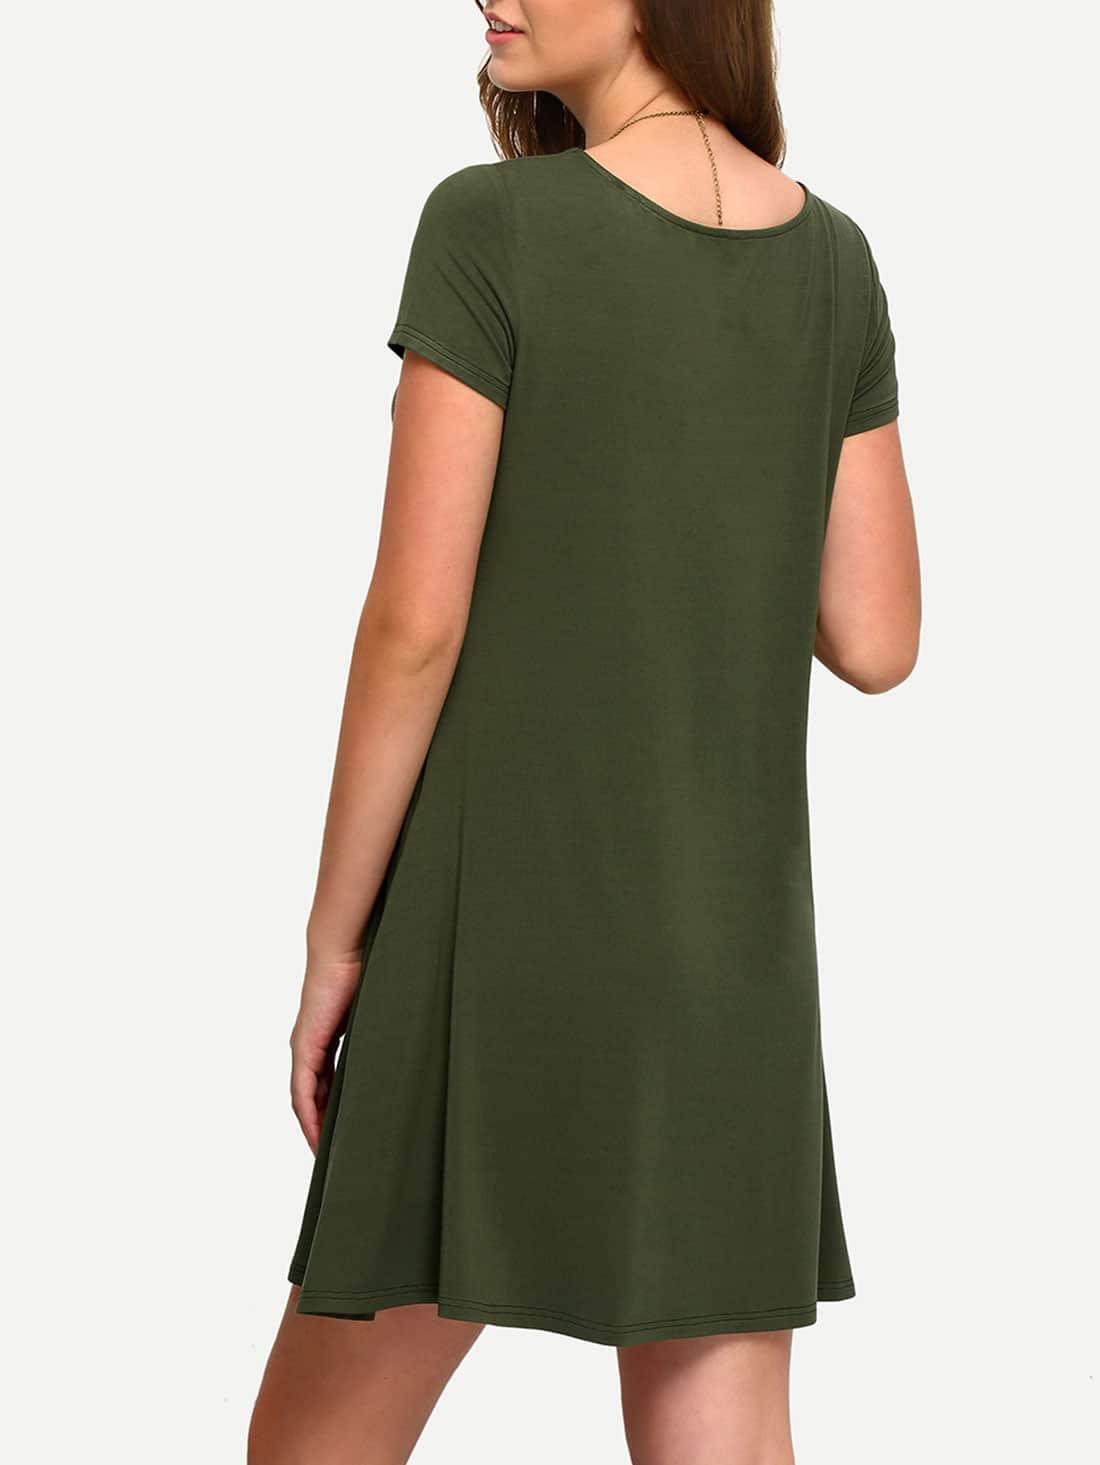 Army Green Short Sleeve Casual Shift Dress